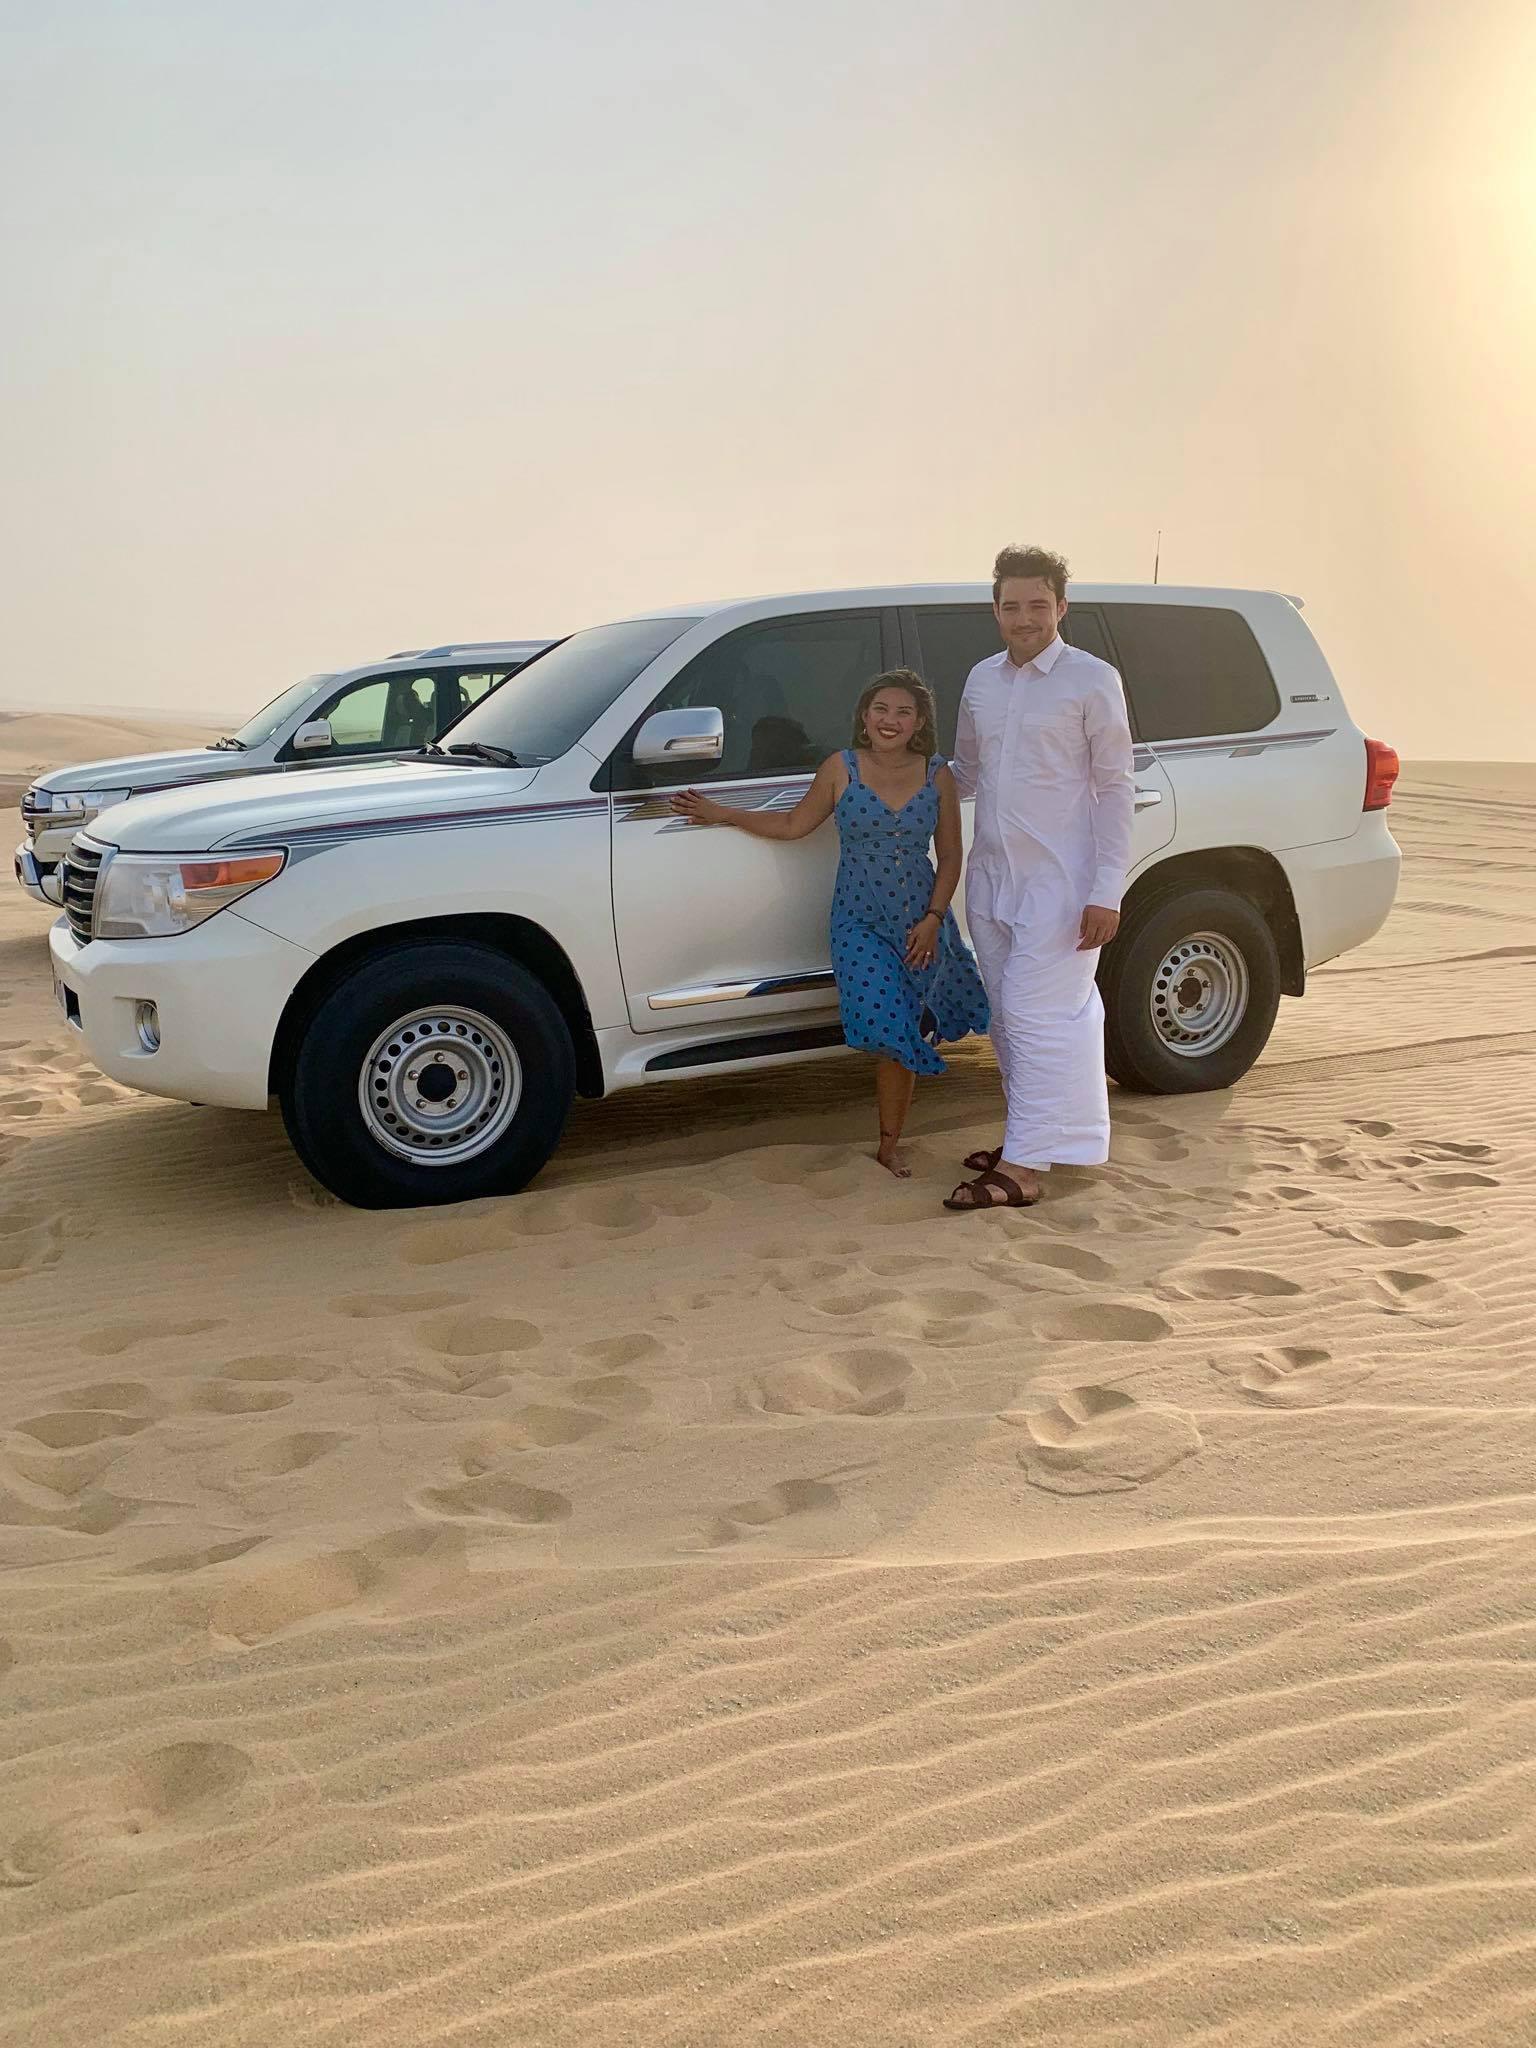 Kach Solo Travels in 2019 I did a 20-hour layover in Doha, QATAR1.jpg